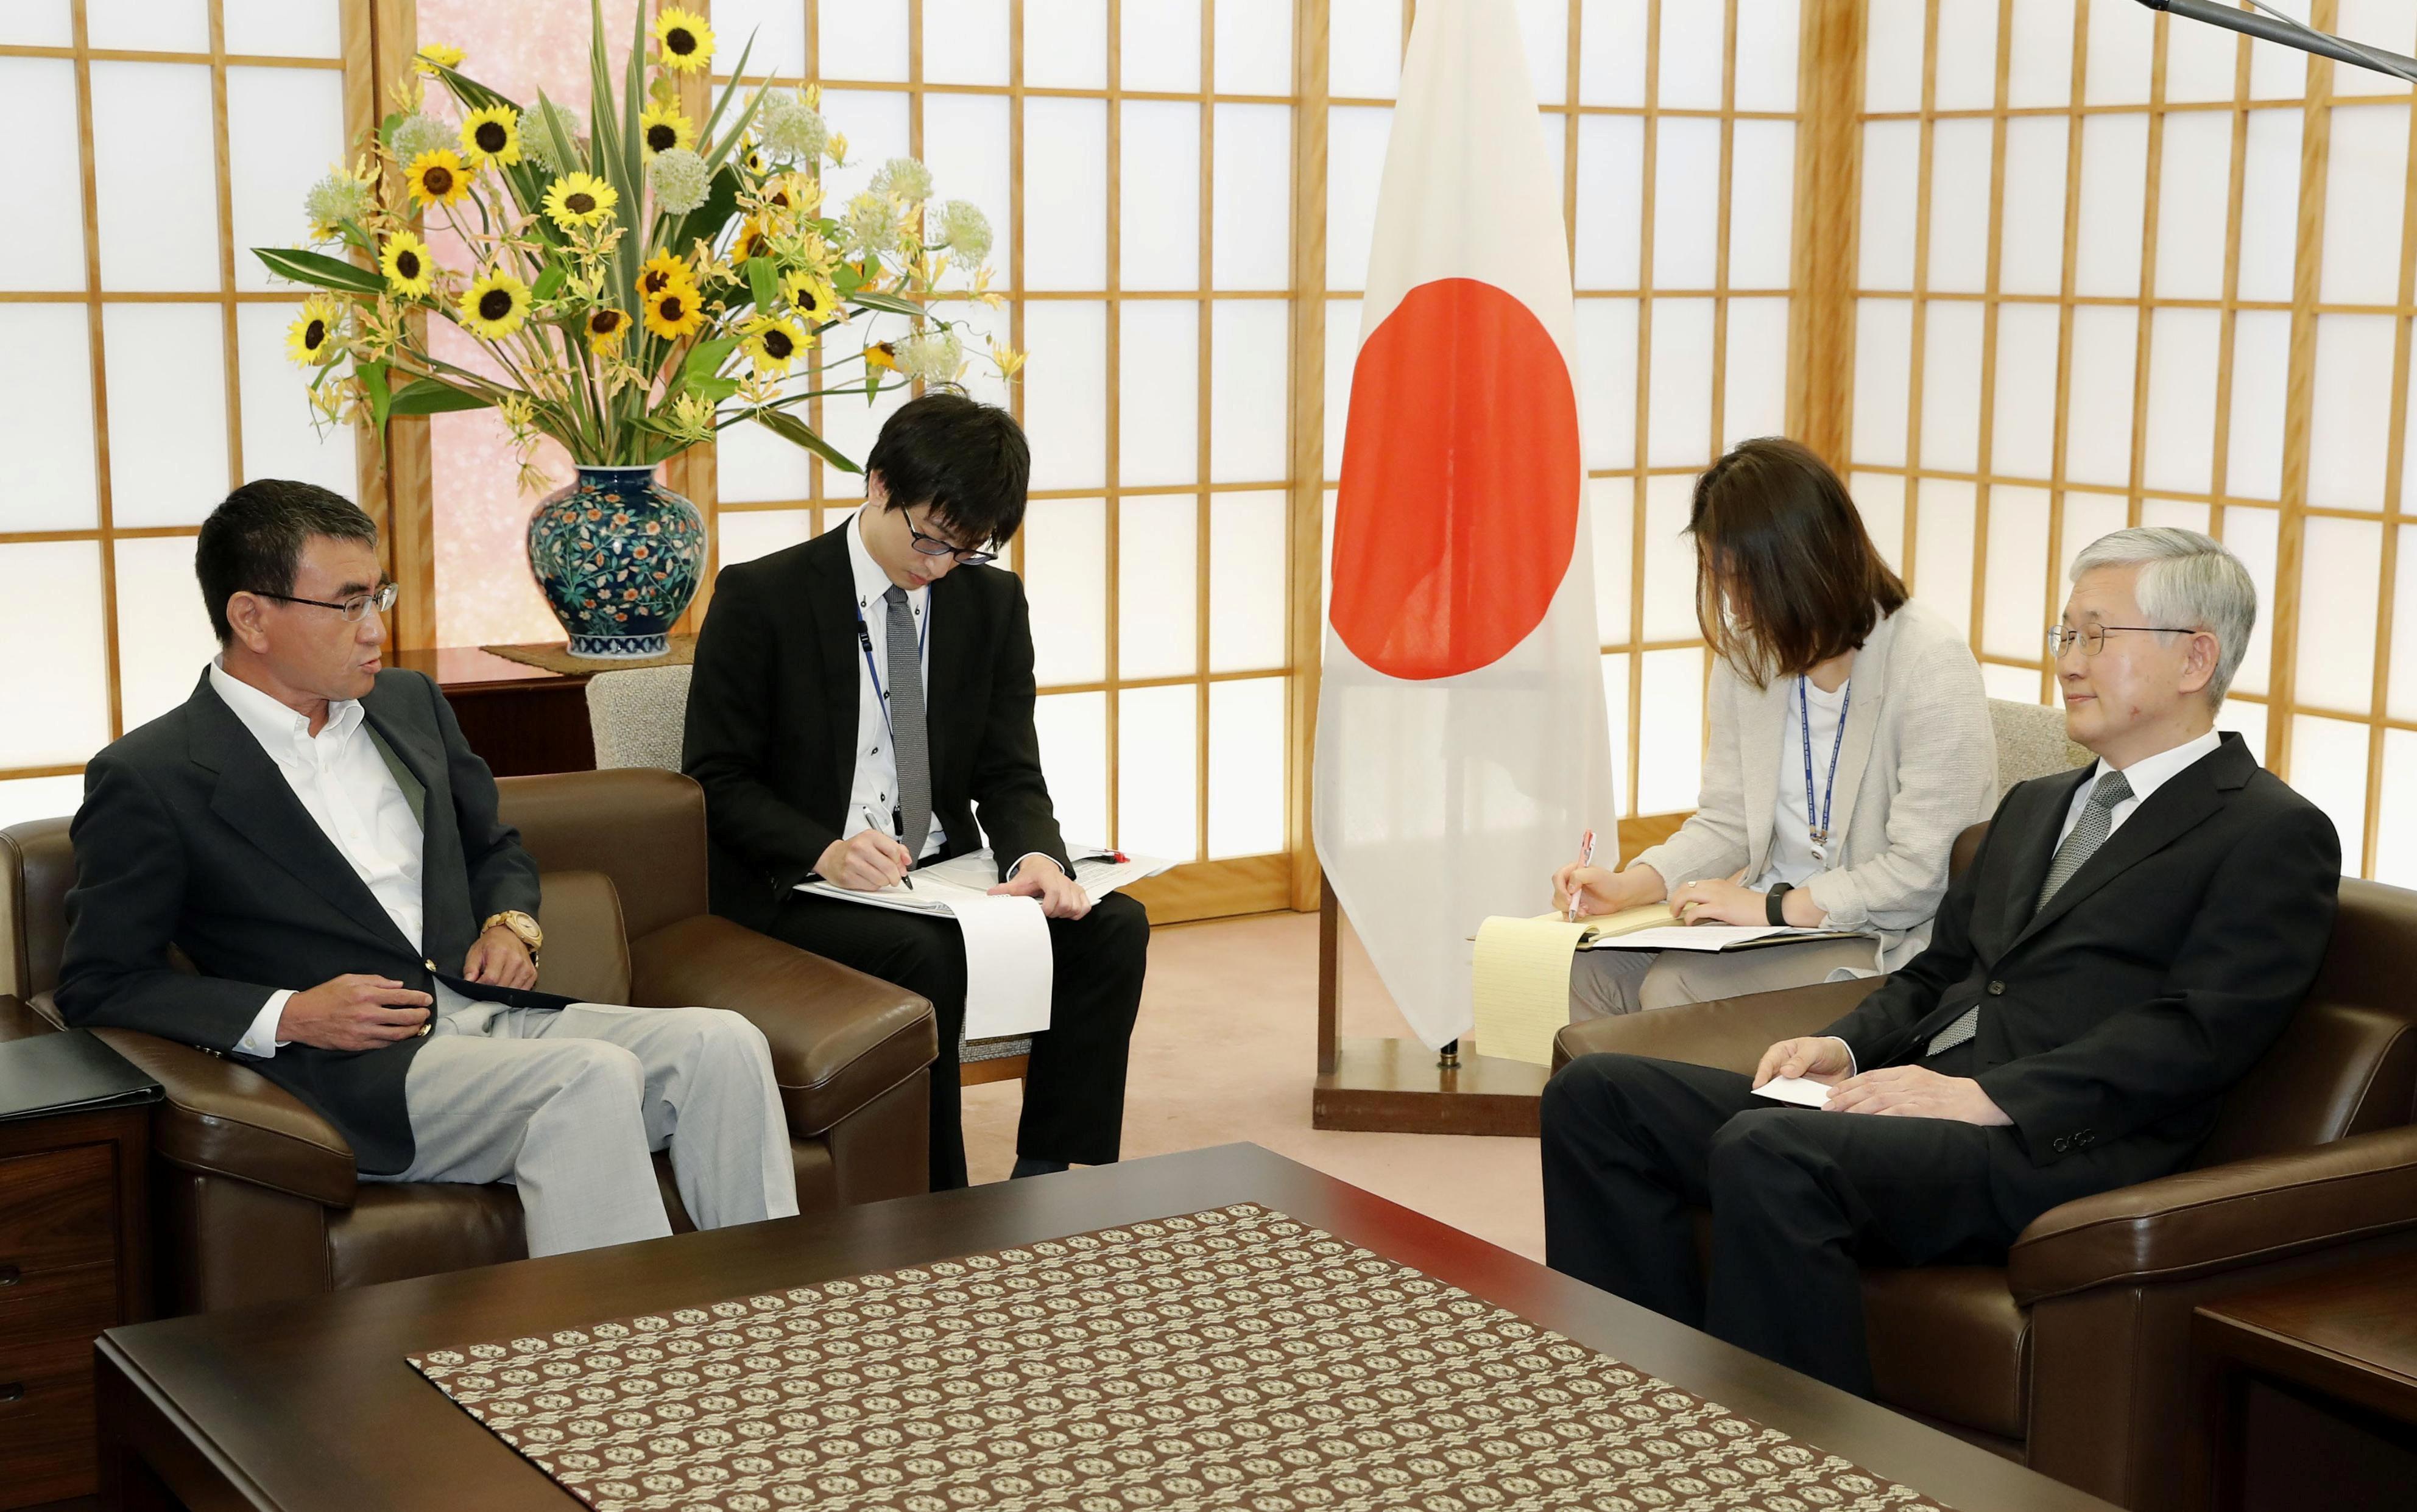 Japanese minister admonishes South Korea's envoy as row escalates